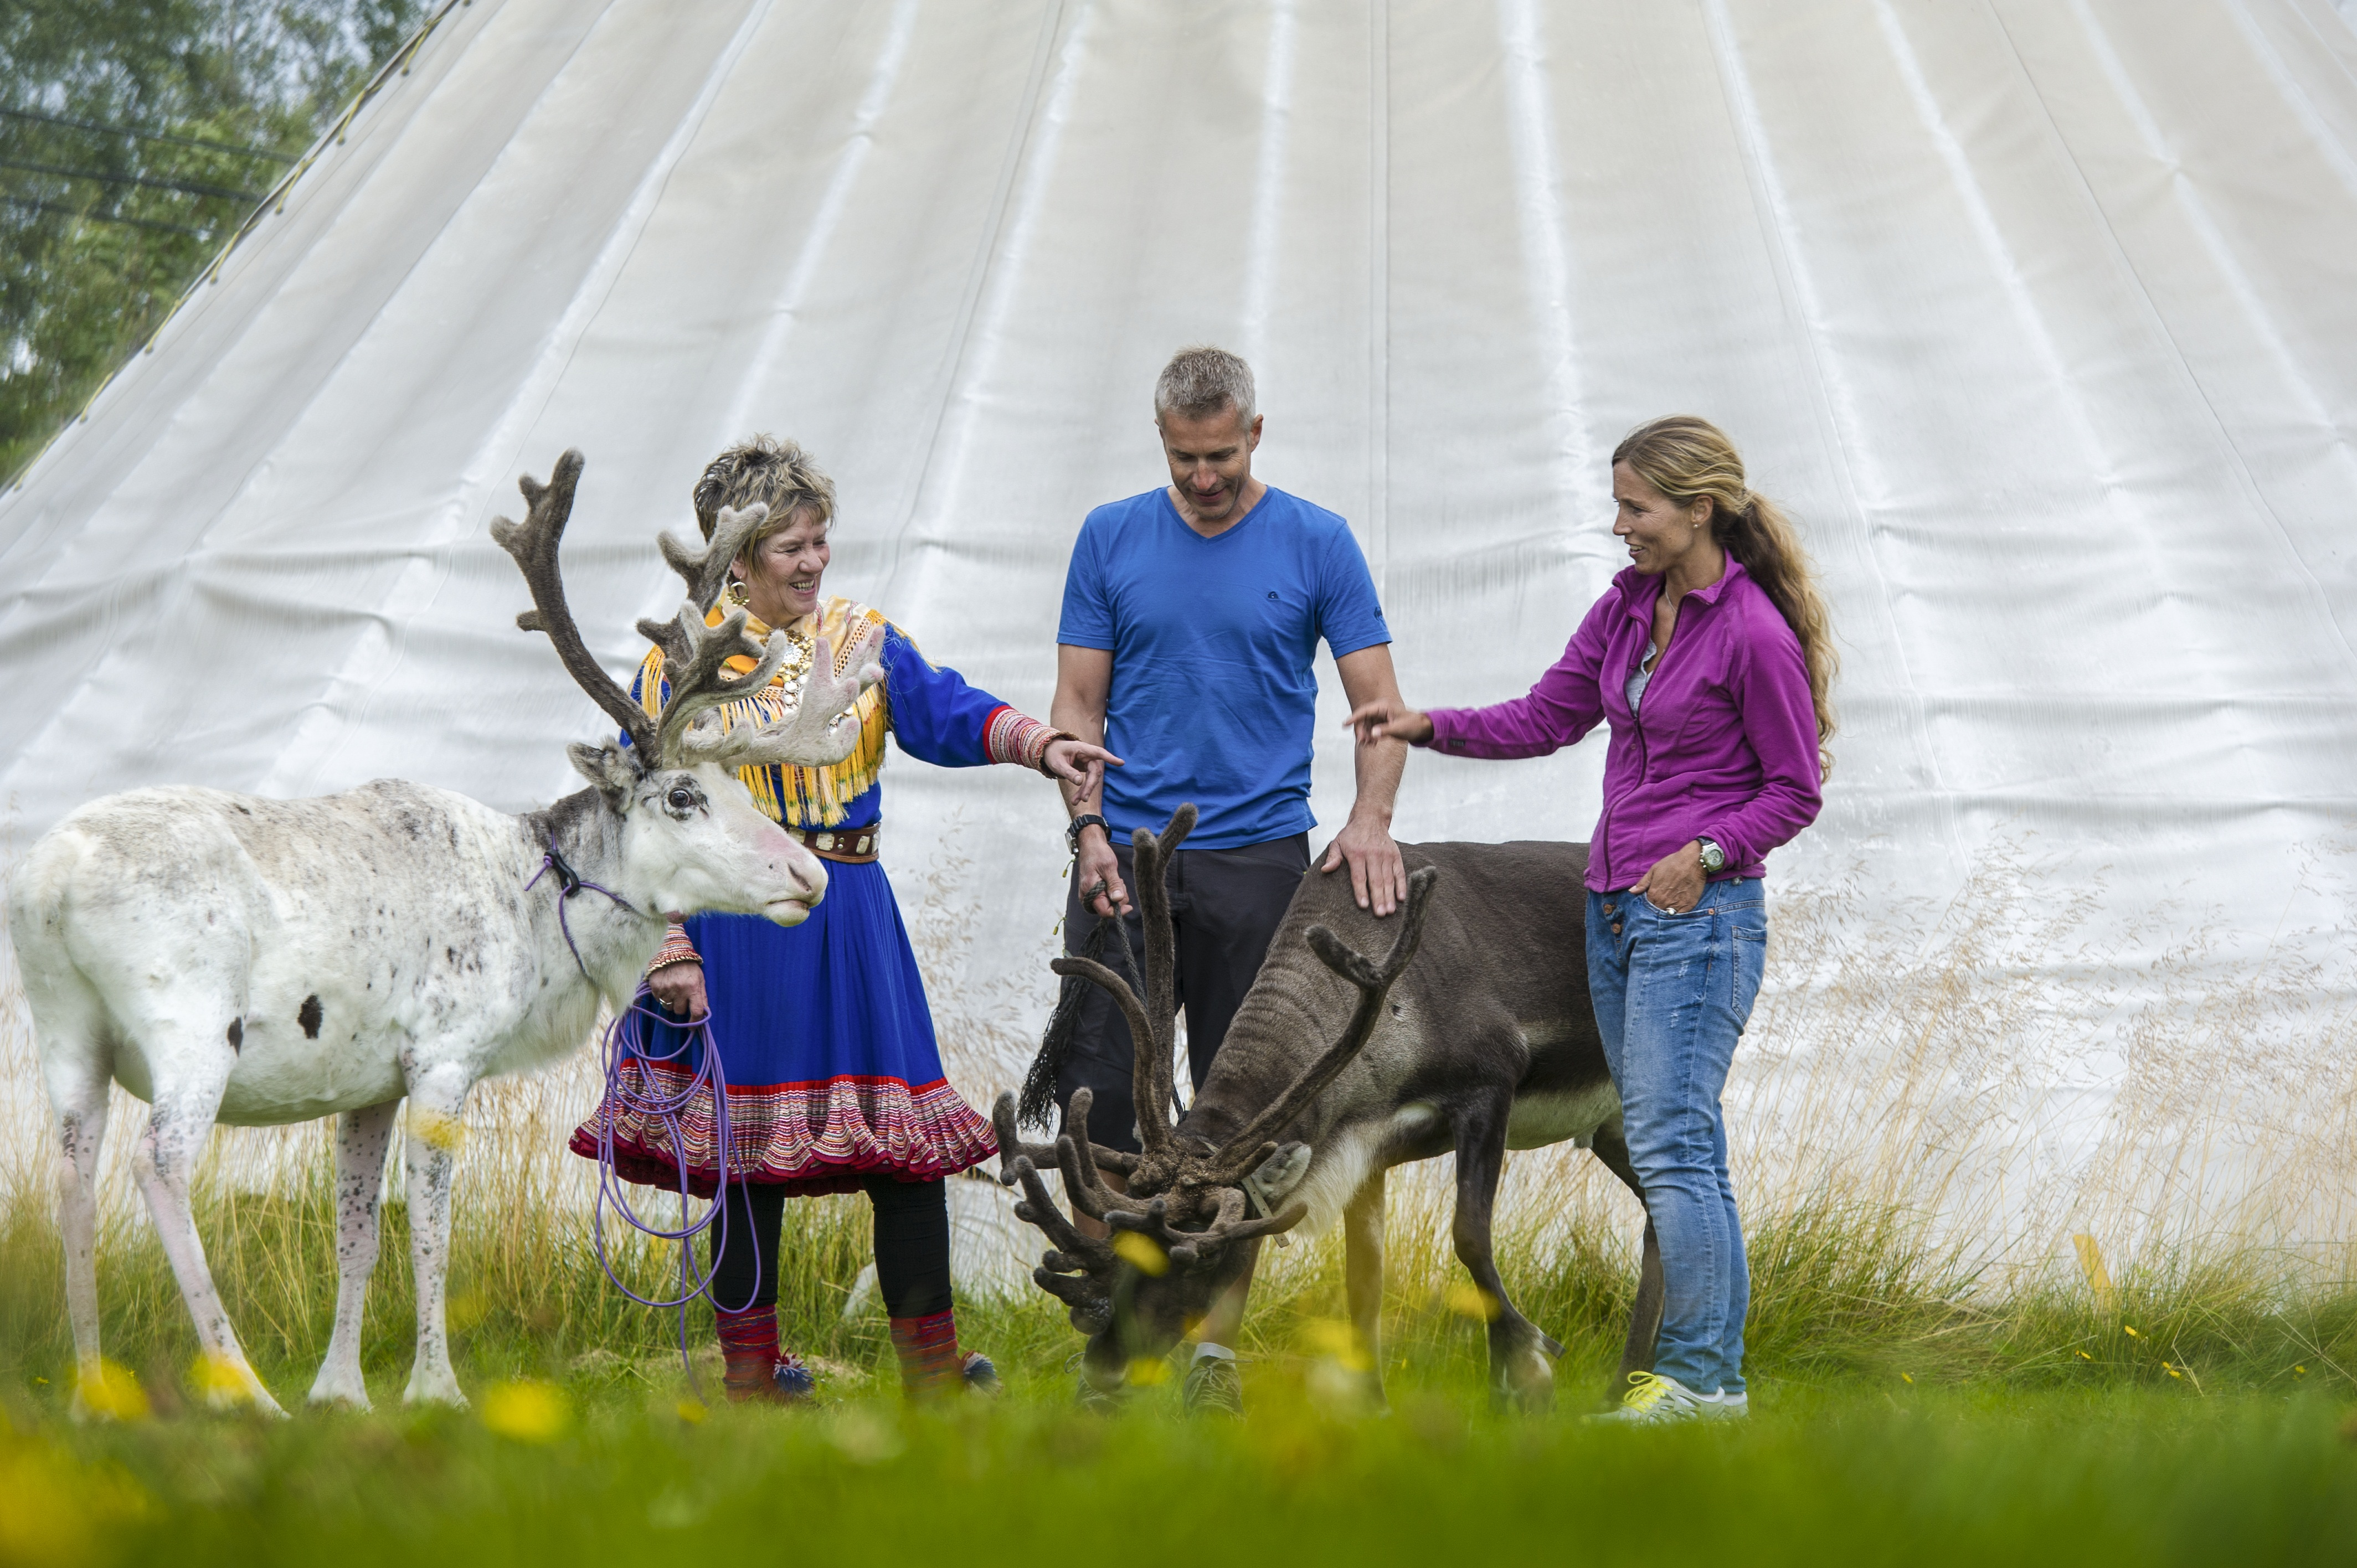 Visiting-the-sami-reindeer-camp-102013-99-0662.JPG